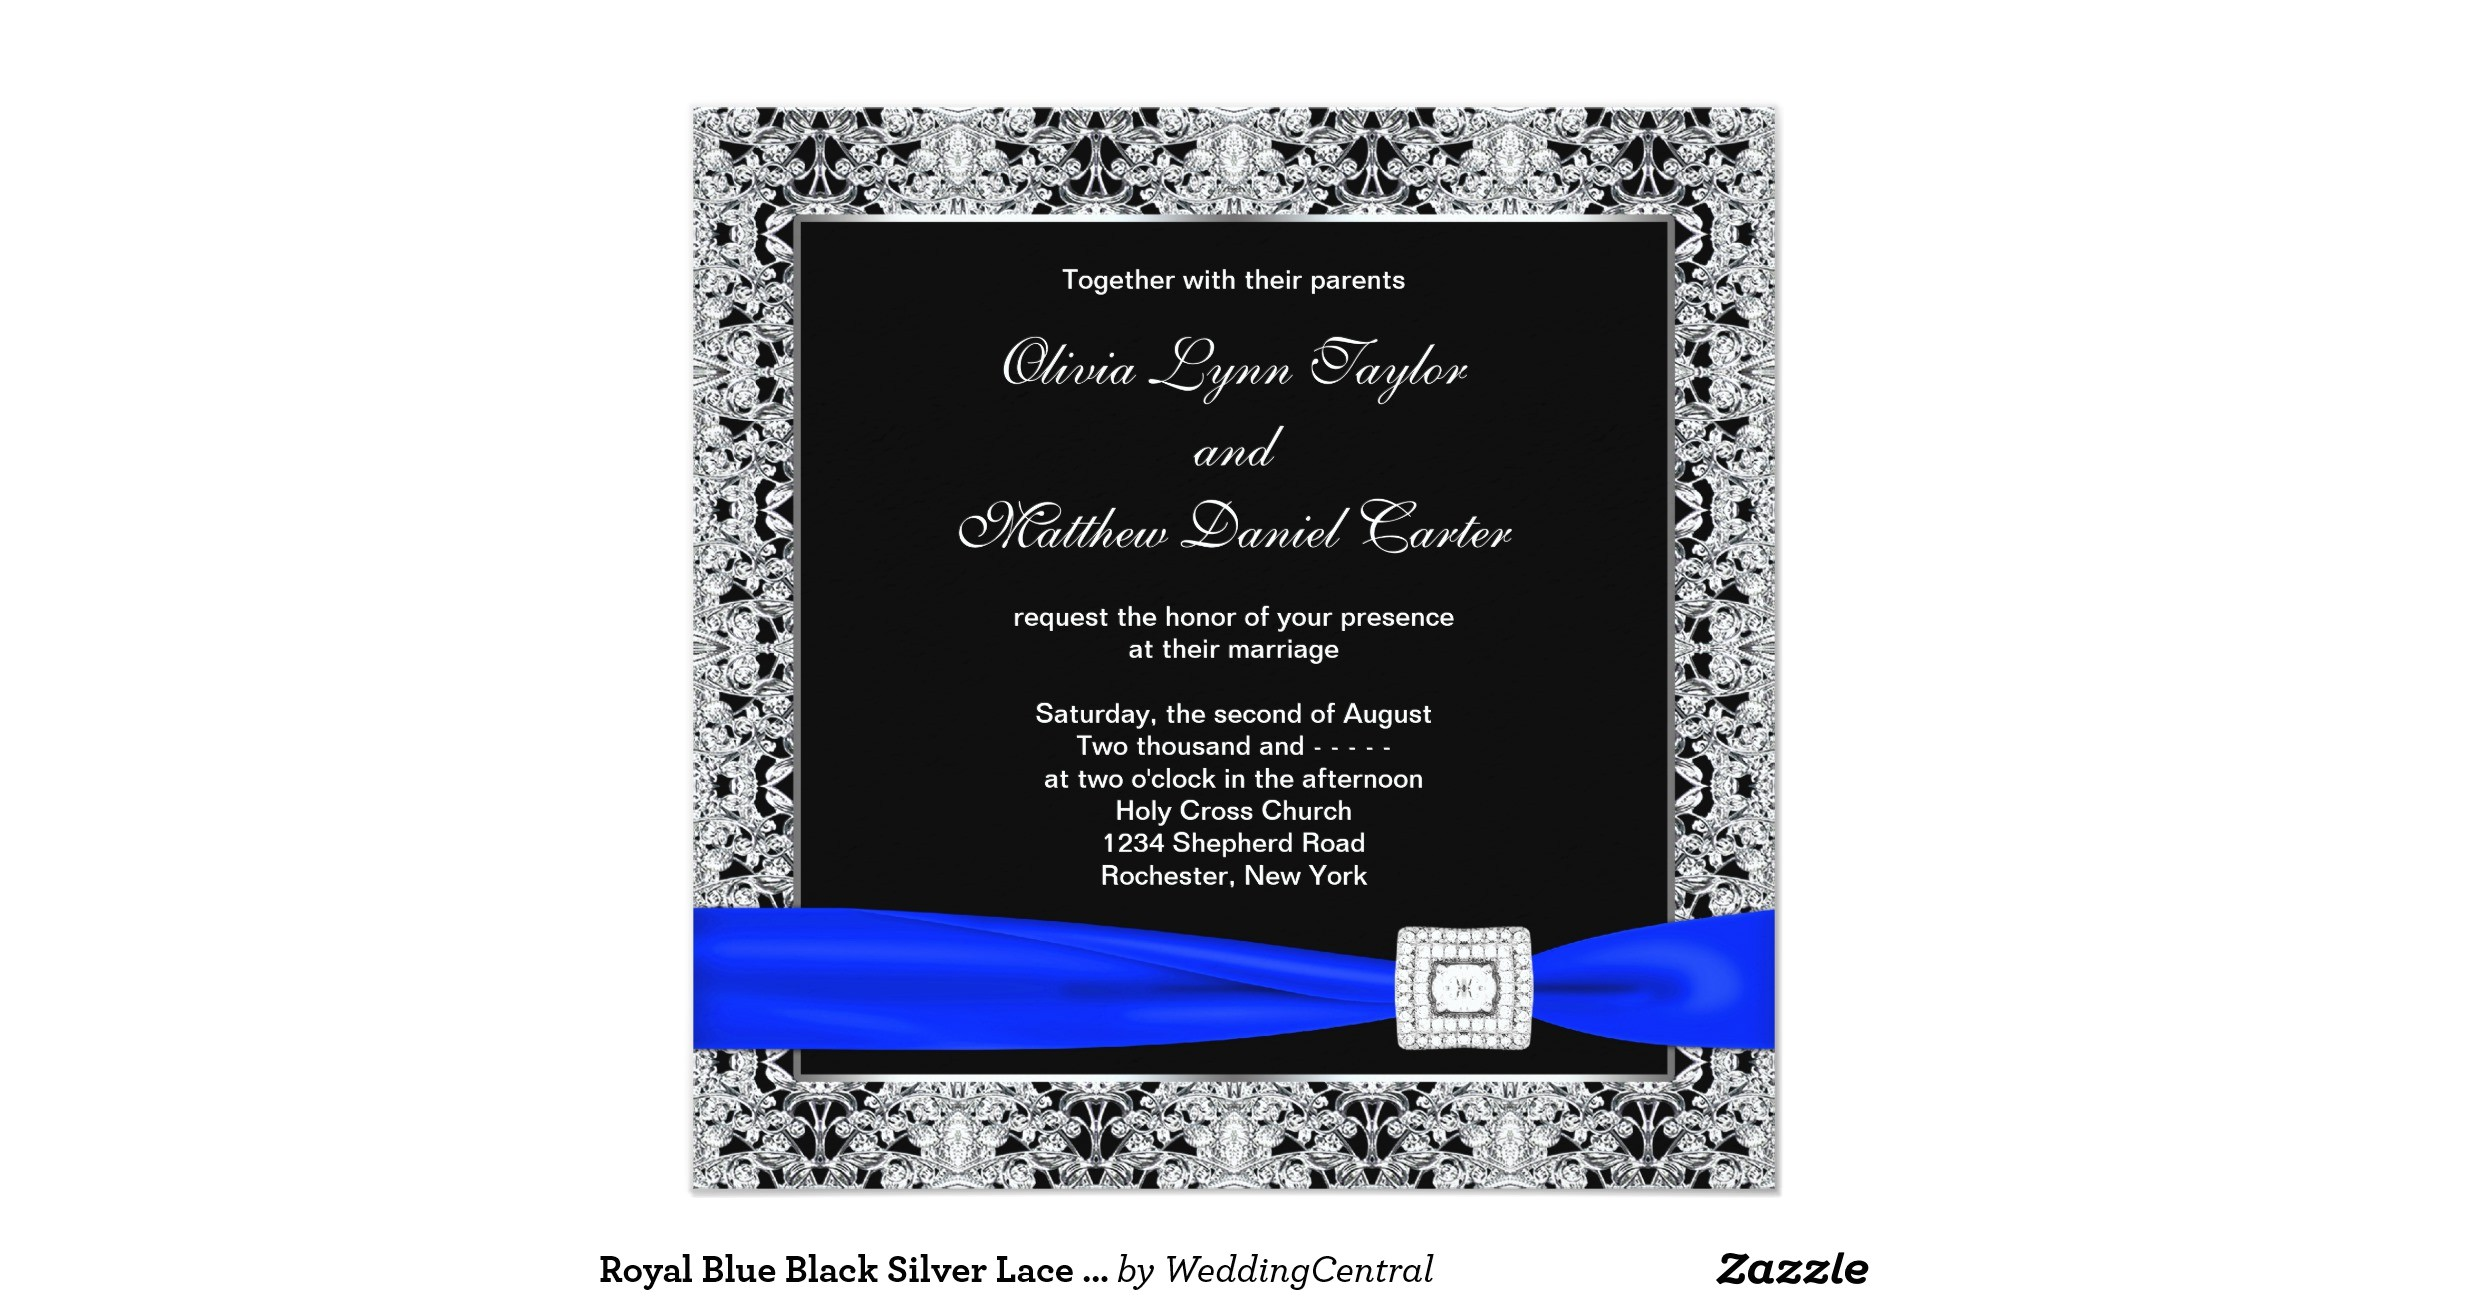 royal blue black silver lace wedding invitation 161621978218997594